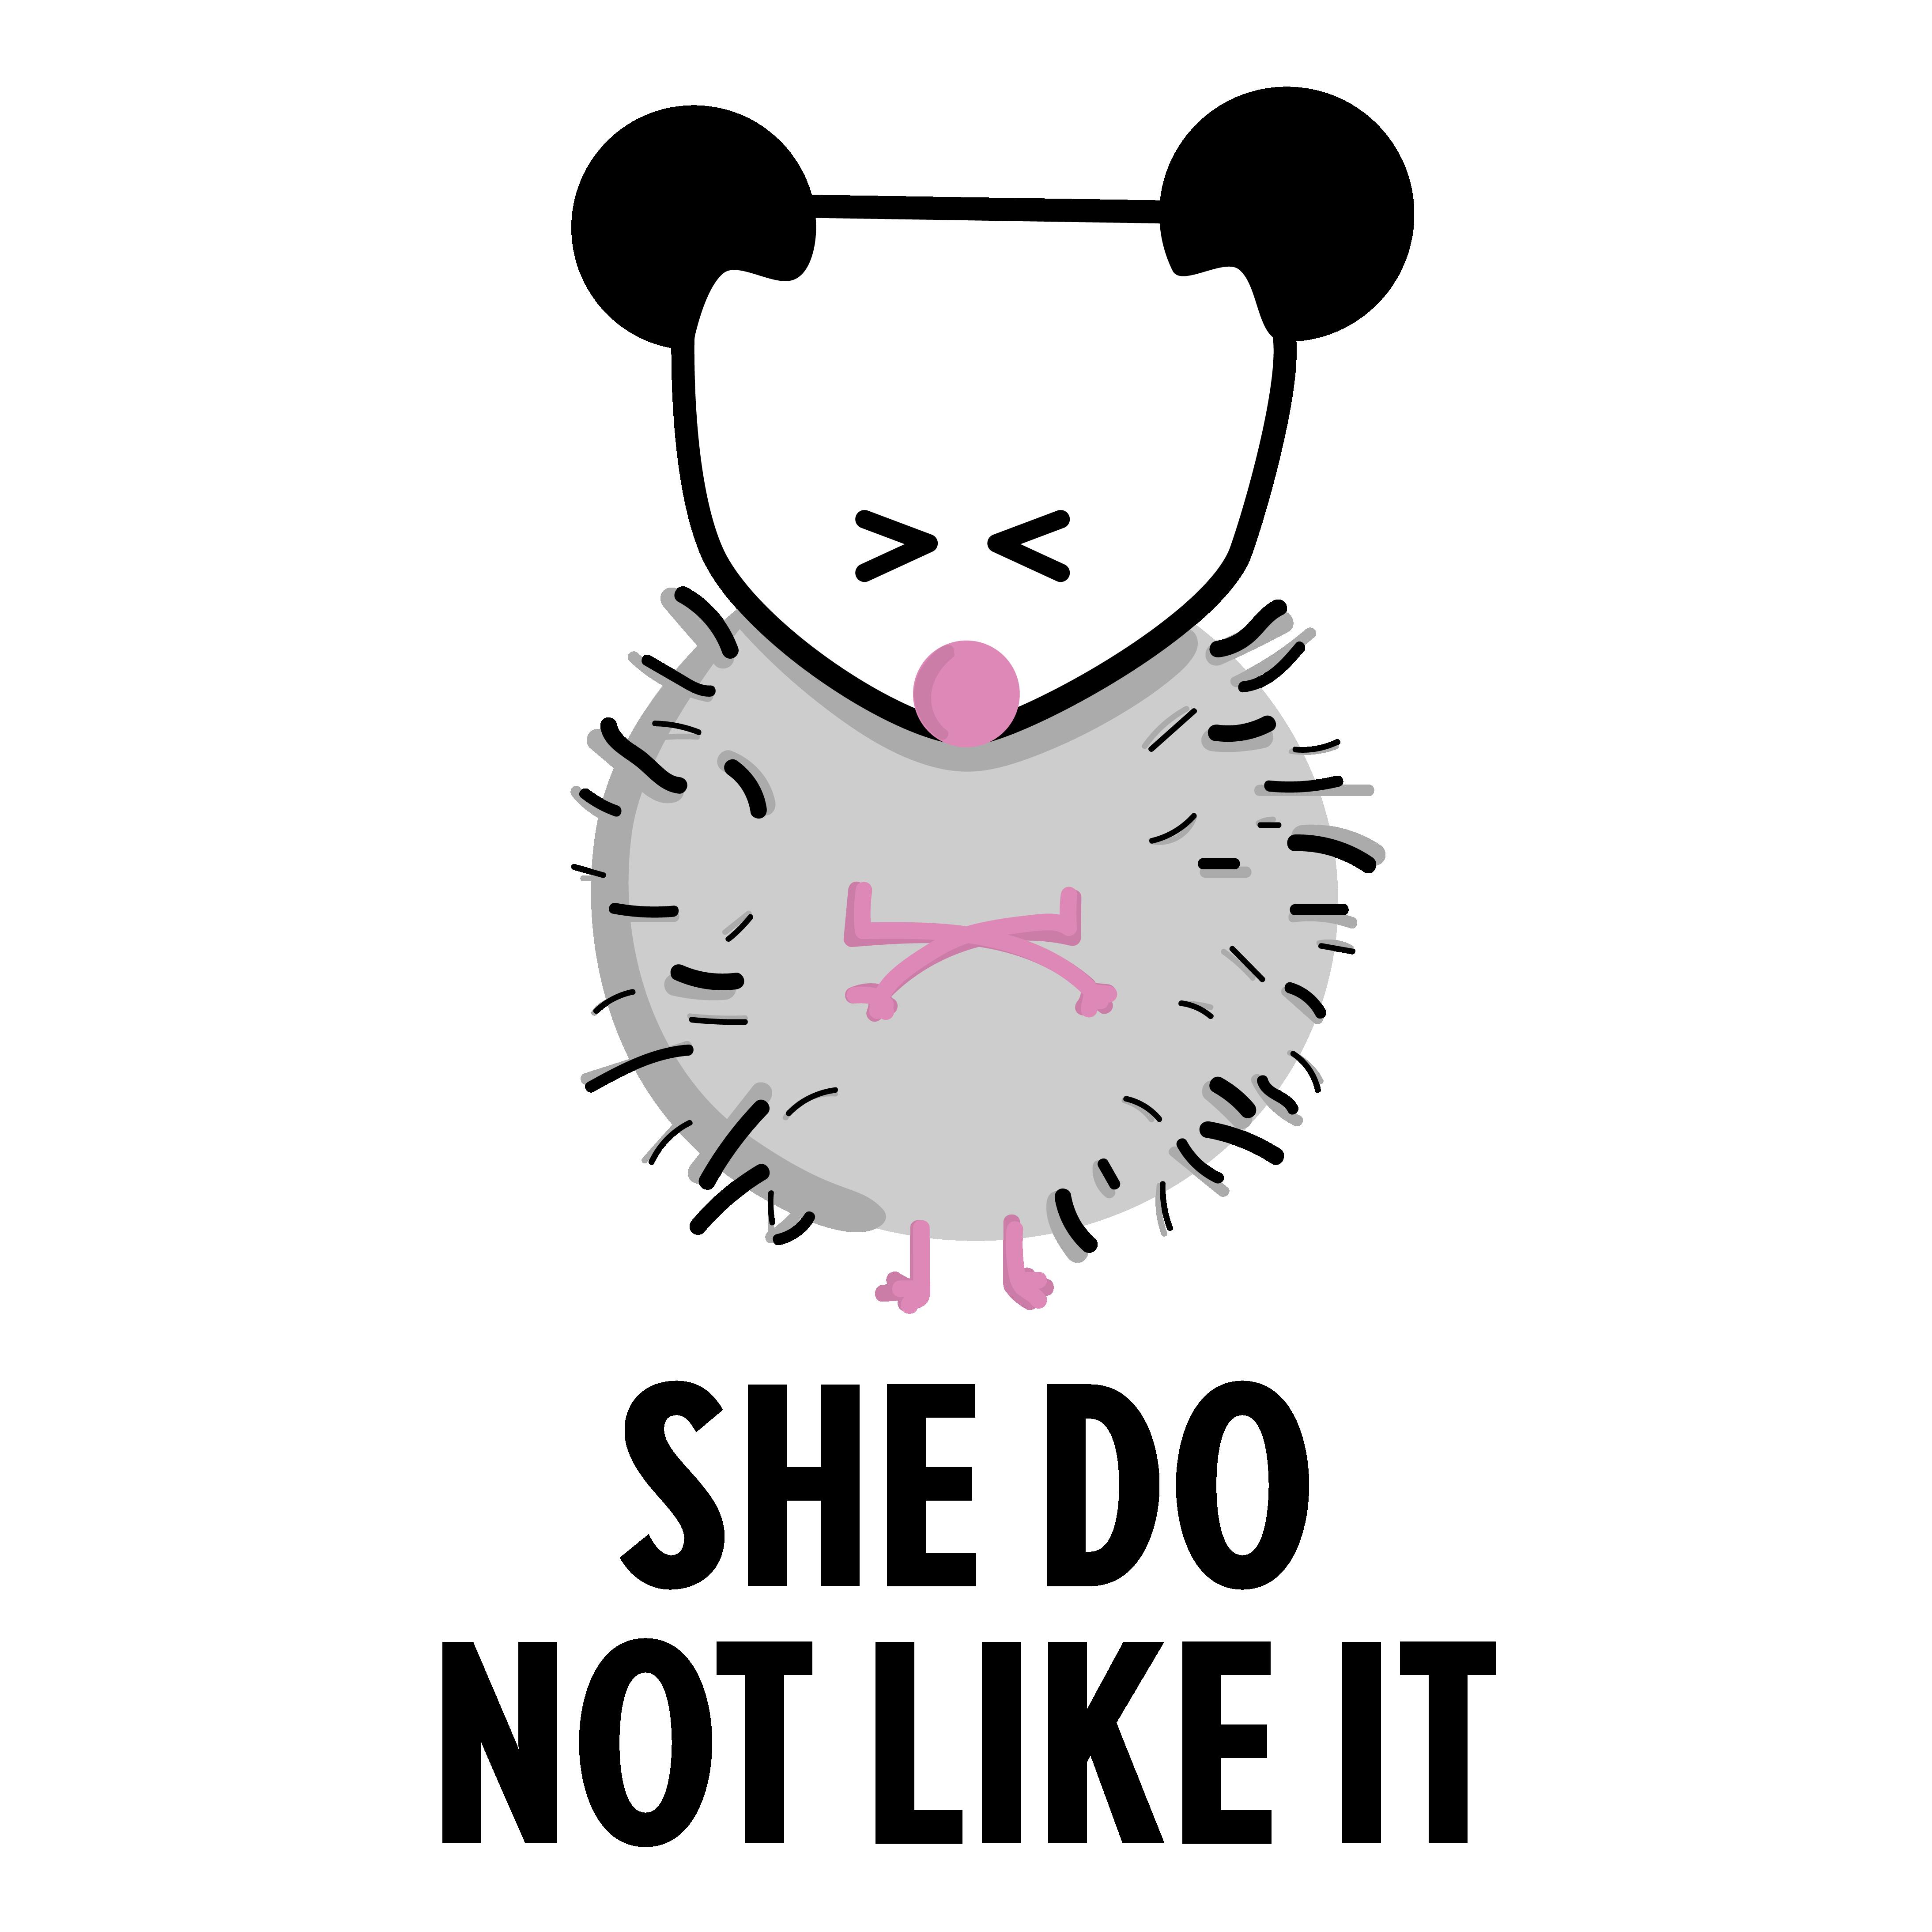 Baby Petunia messages sticker-4